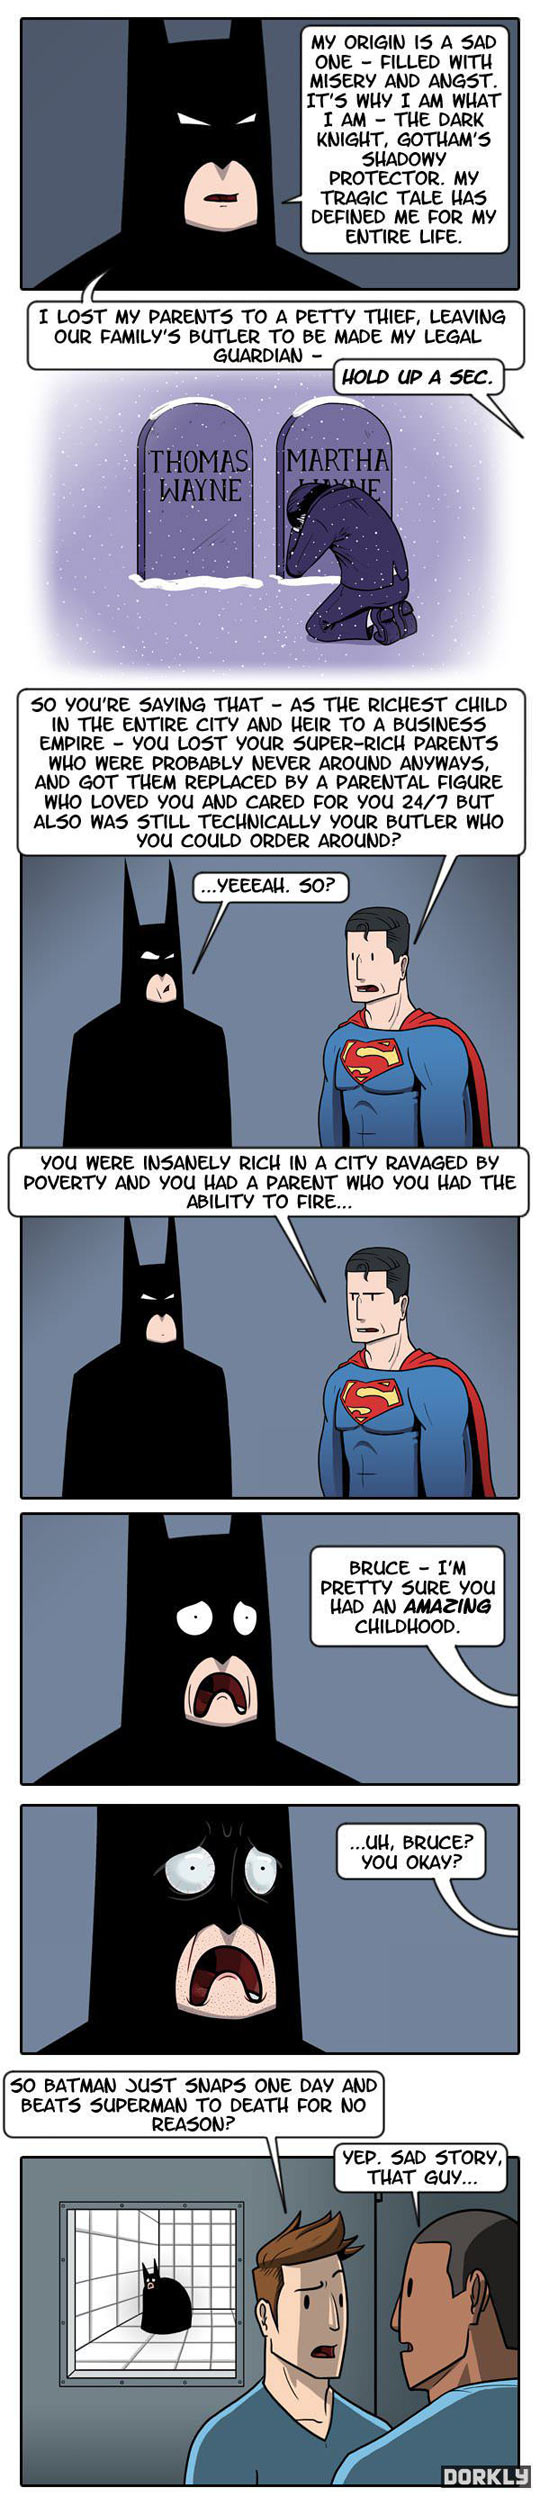 funny-Batman-Superman-childhood-discussing